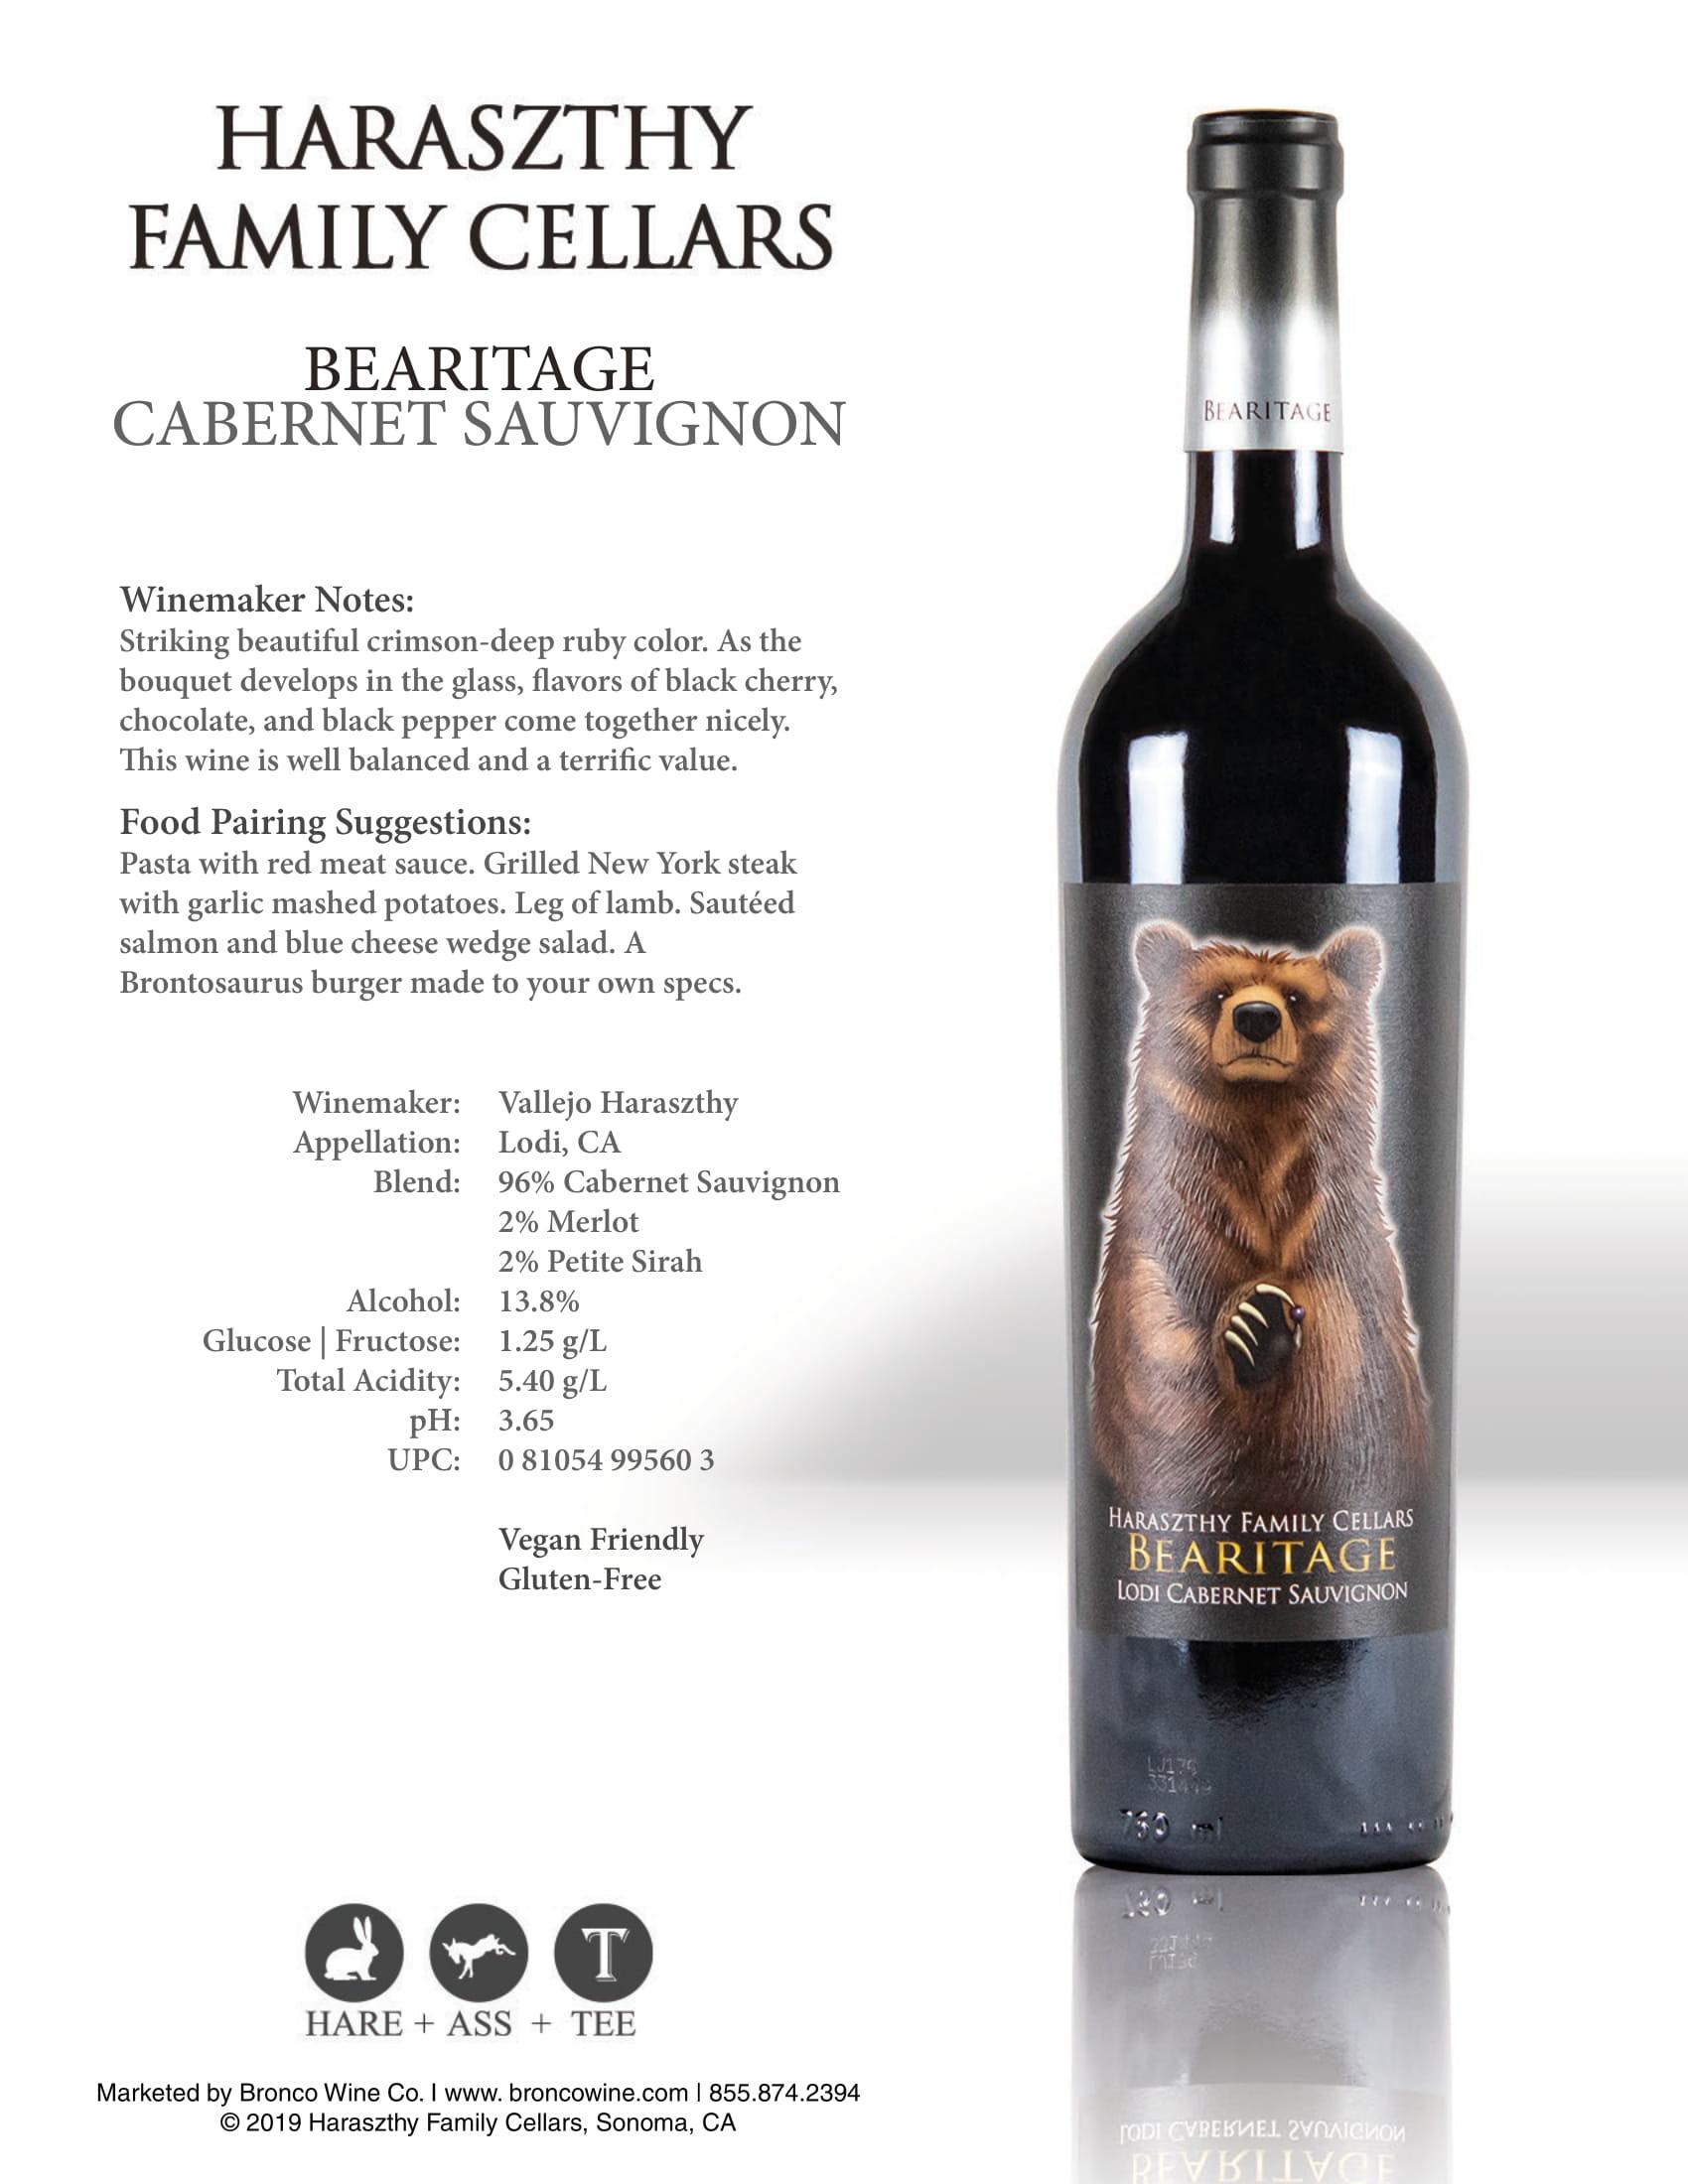 Haraszthy Bearitage Cabernet Sauvignon Tech Sheet